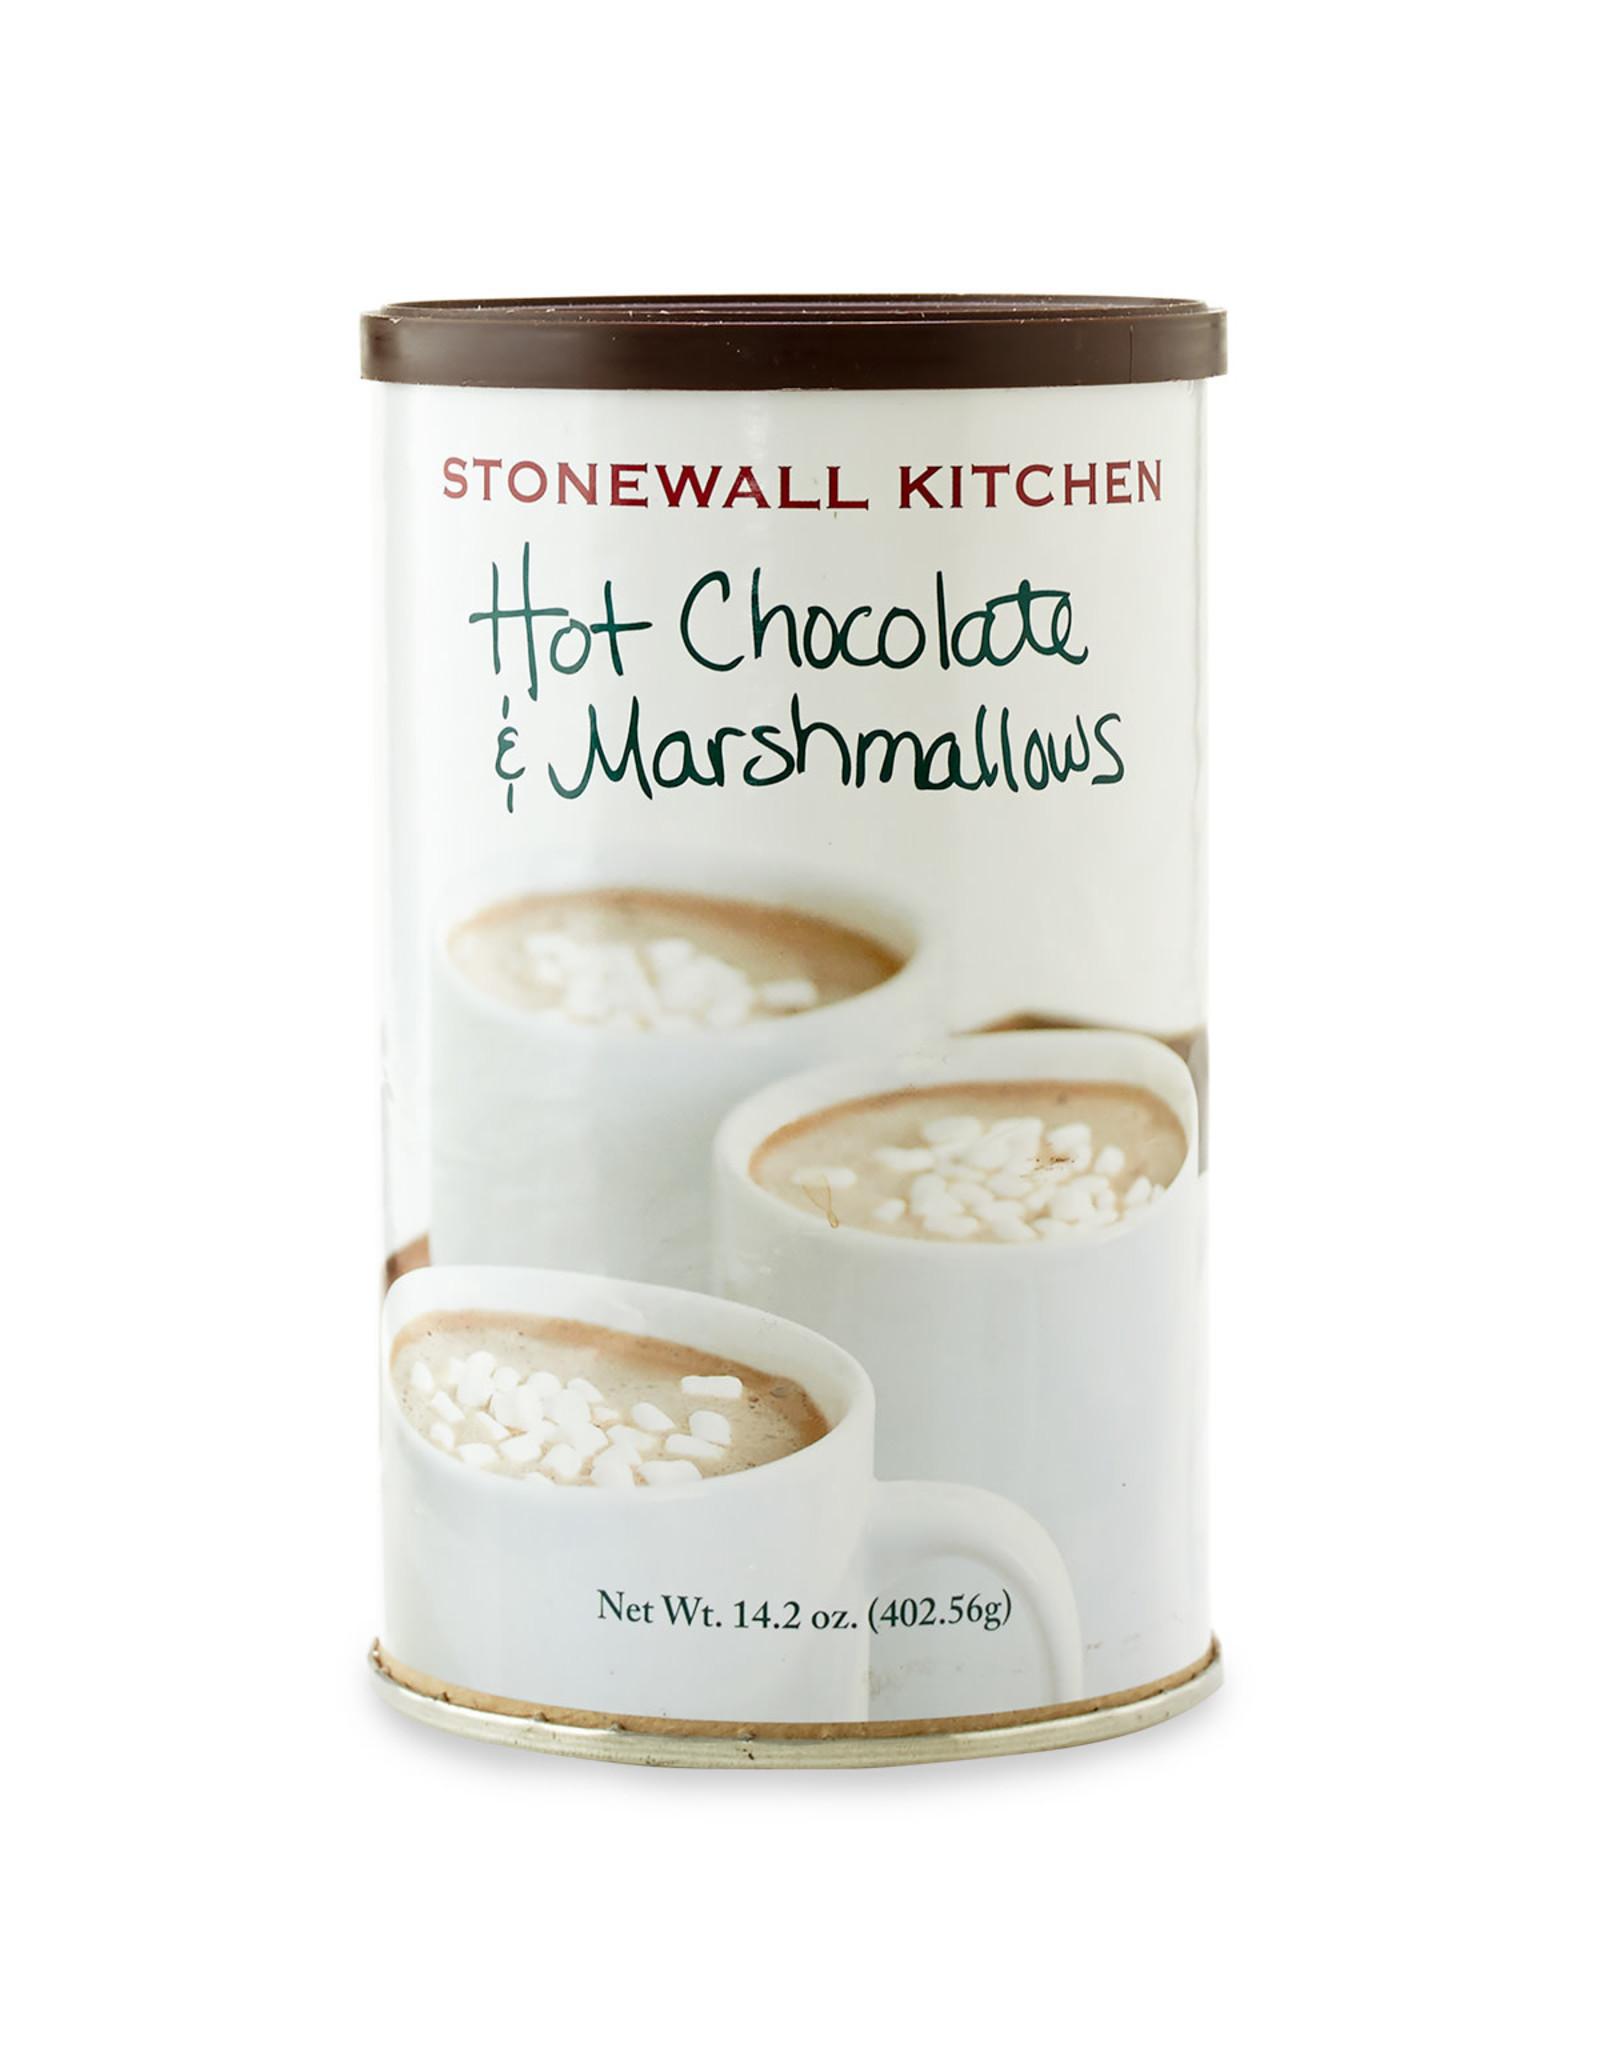 Stonewall Kitchen HOT CHOCOLATE AND MARSHMALLOWS